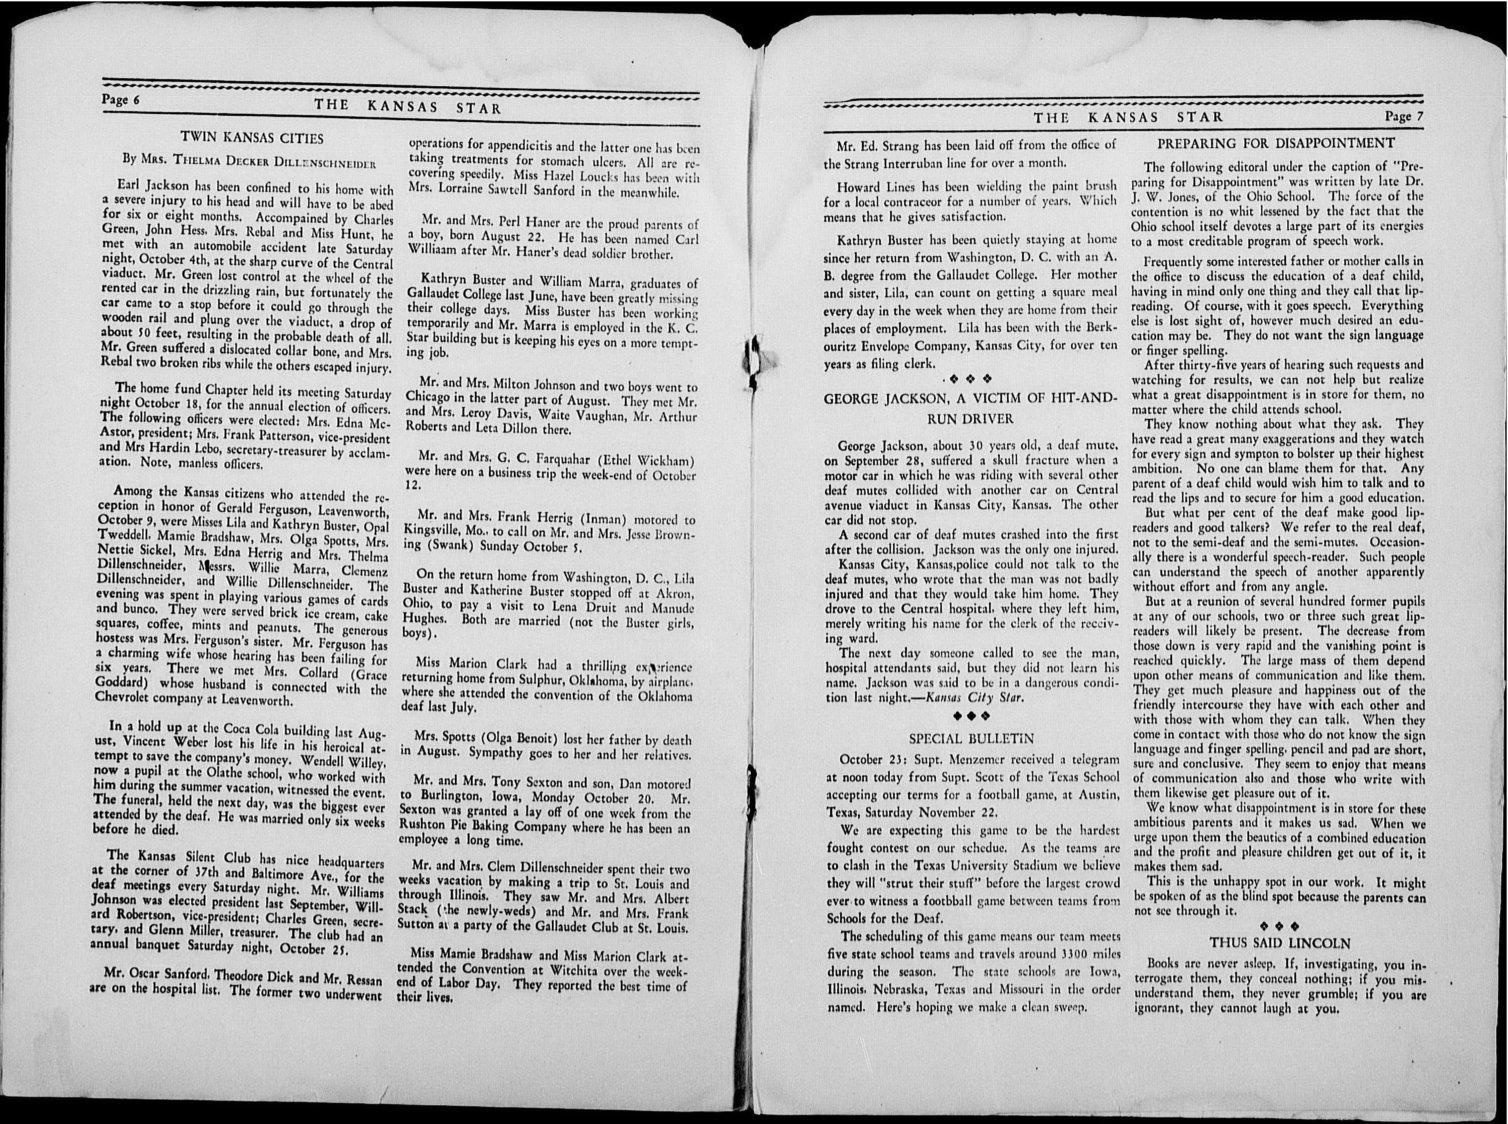 The Kansas Star, volume 44, number 2 - 6-7